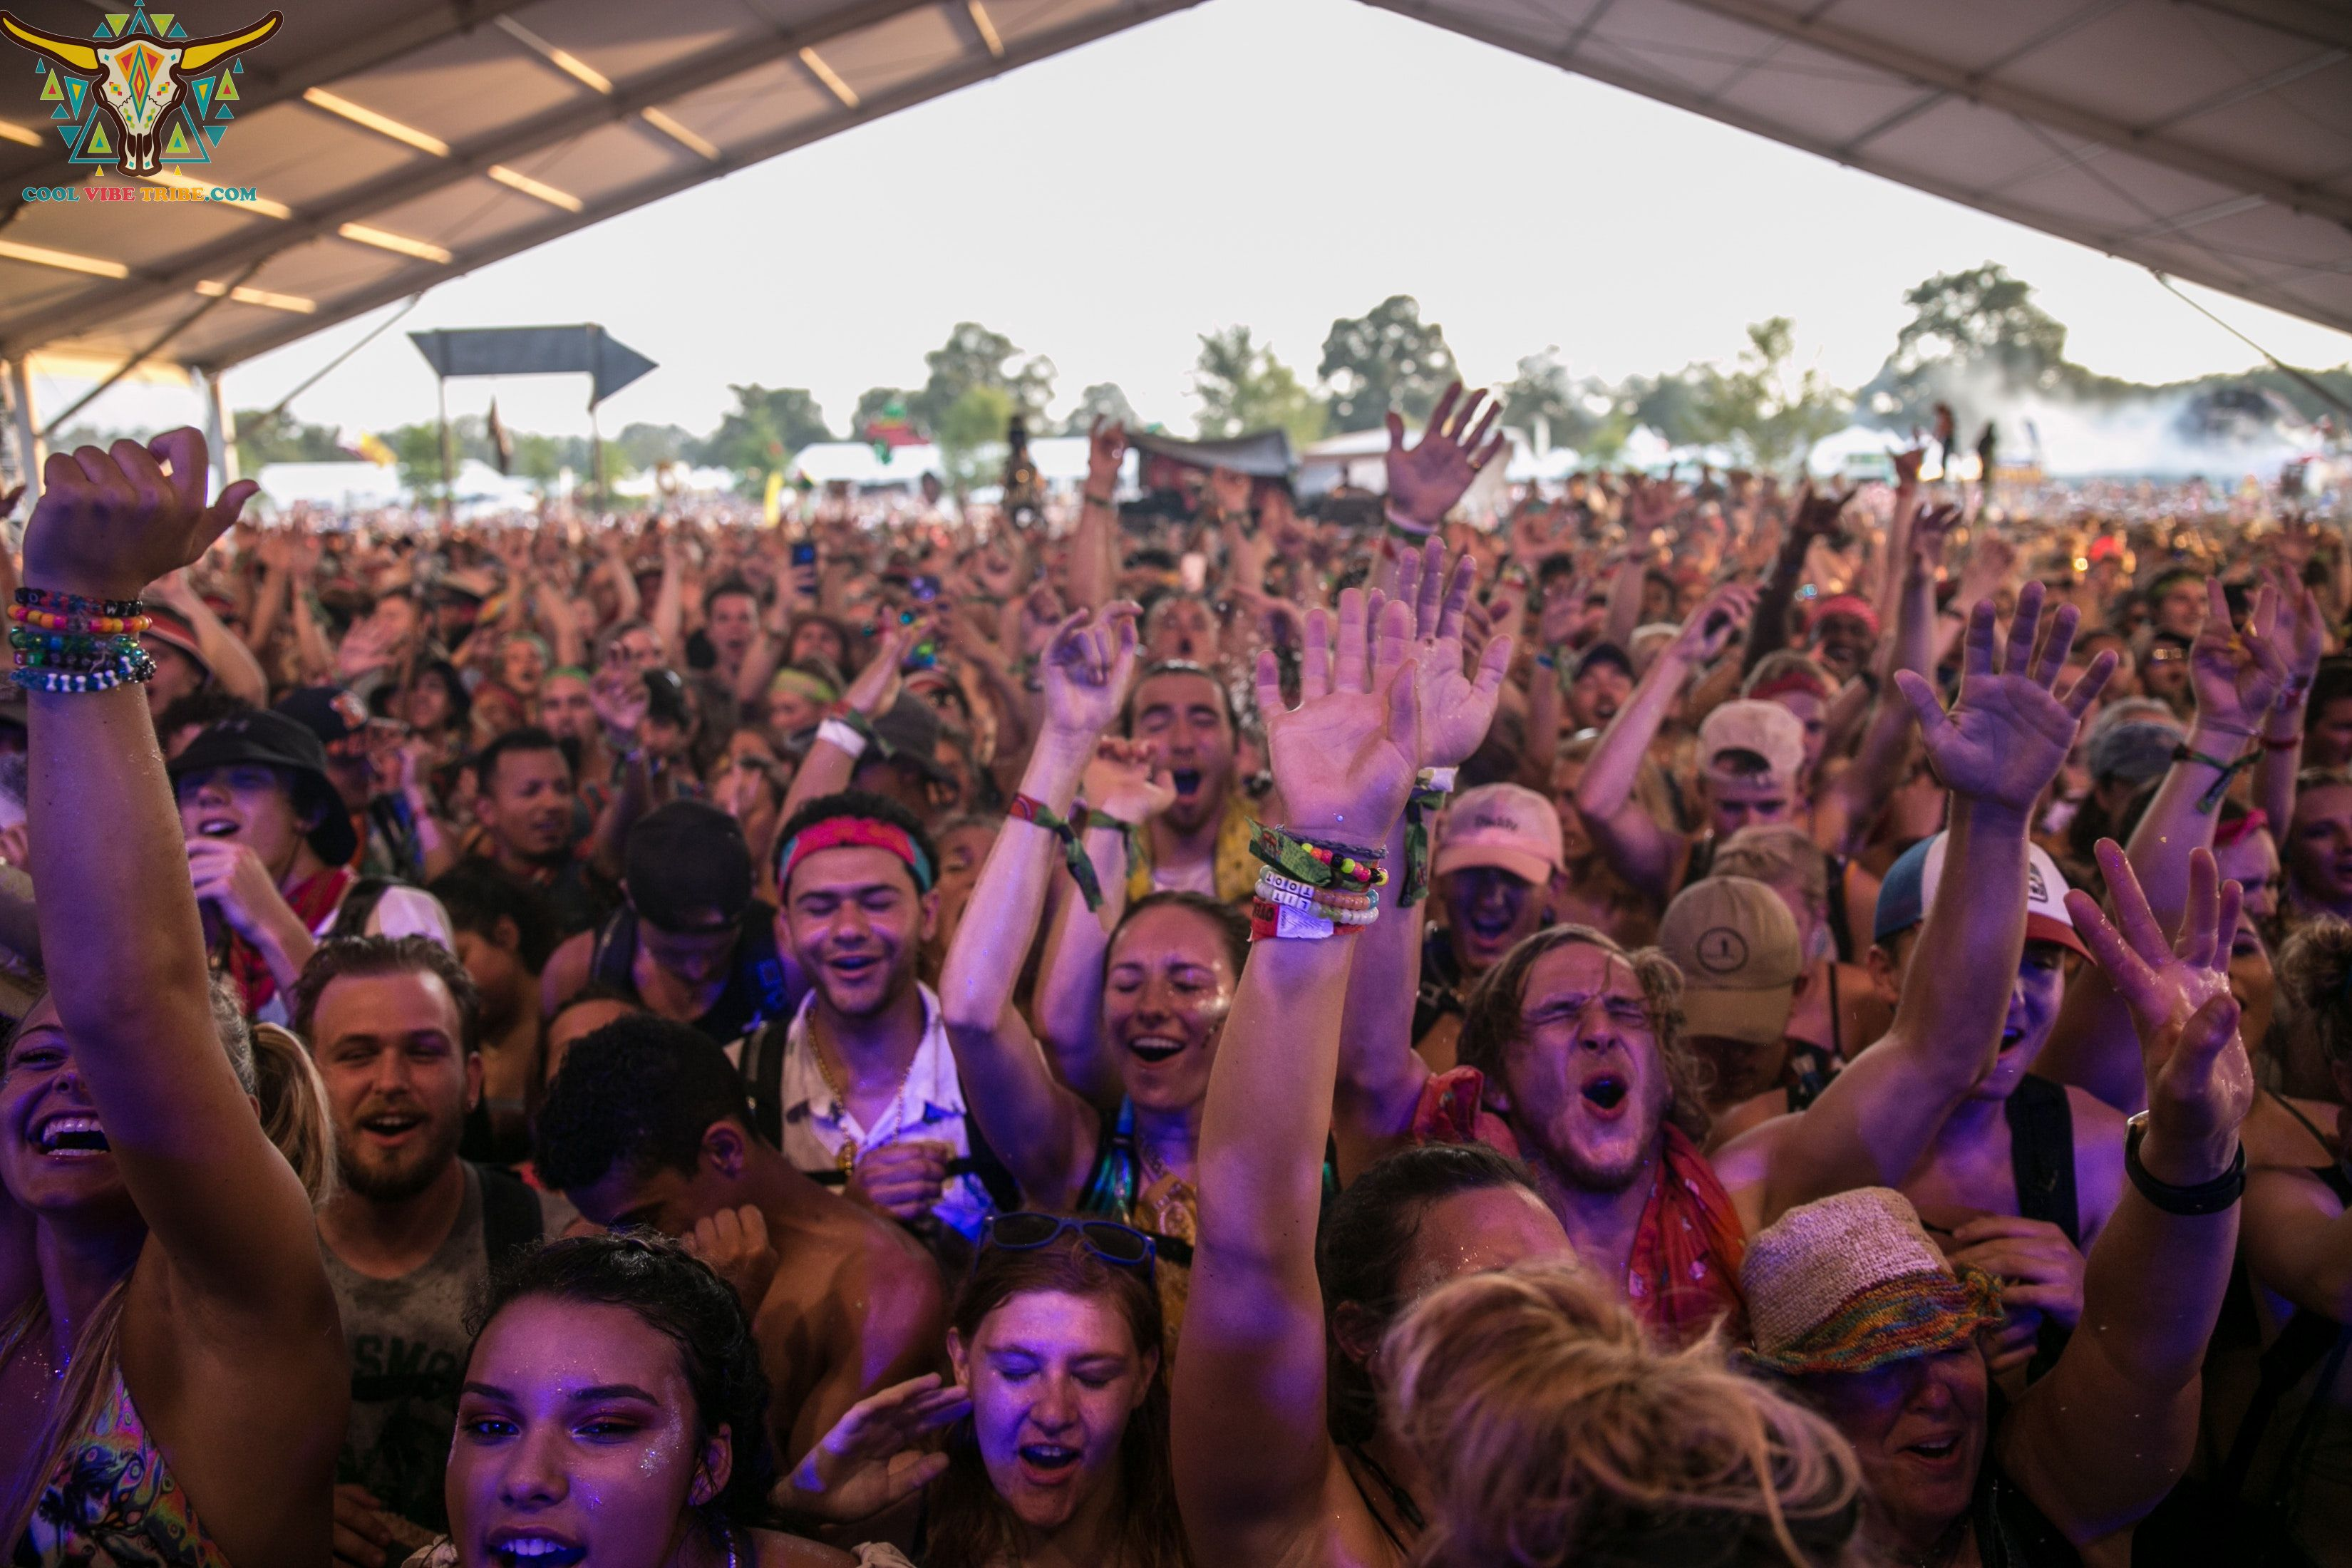 #tomorrowland #fesivals #festival #party #dancing #rave #house #housemusic #techno #techhouse #technohouse #dance #psychedelictrance #psychedelictrancemusic #fun #night #nightout #ozorafestival #ozora #boomfestival #Ilovetechno #rainbowpeople #musicfestival #musicfestivals #trip #trippy #acid #lsd #magicmushroom